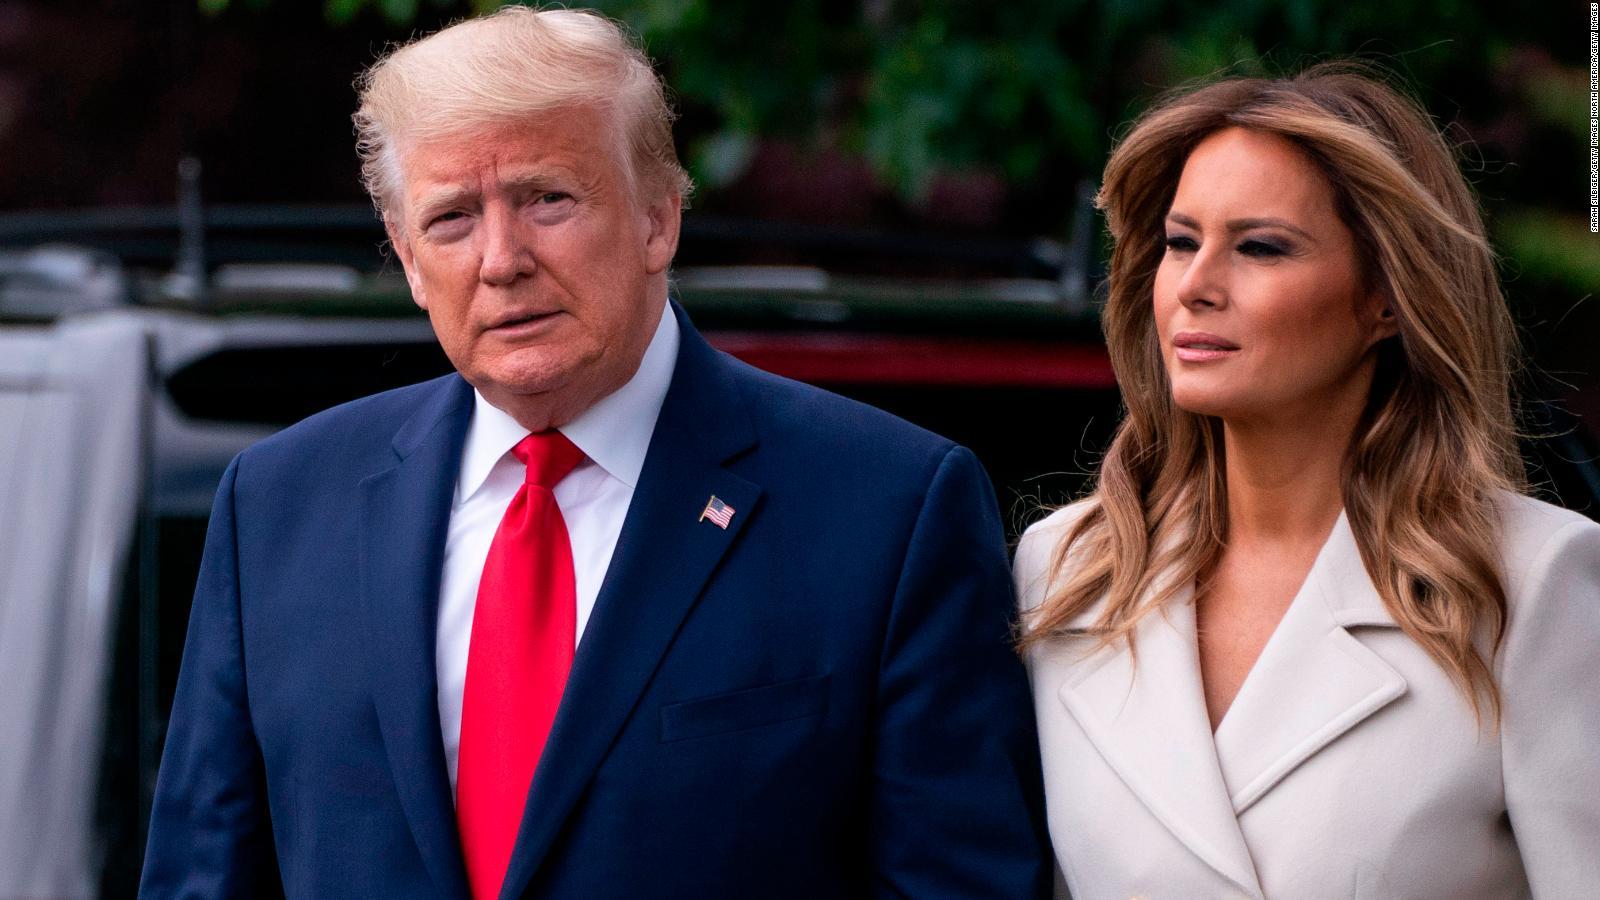 Dirty Scandalous Photos Of Melania Trump photo 3